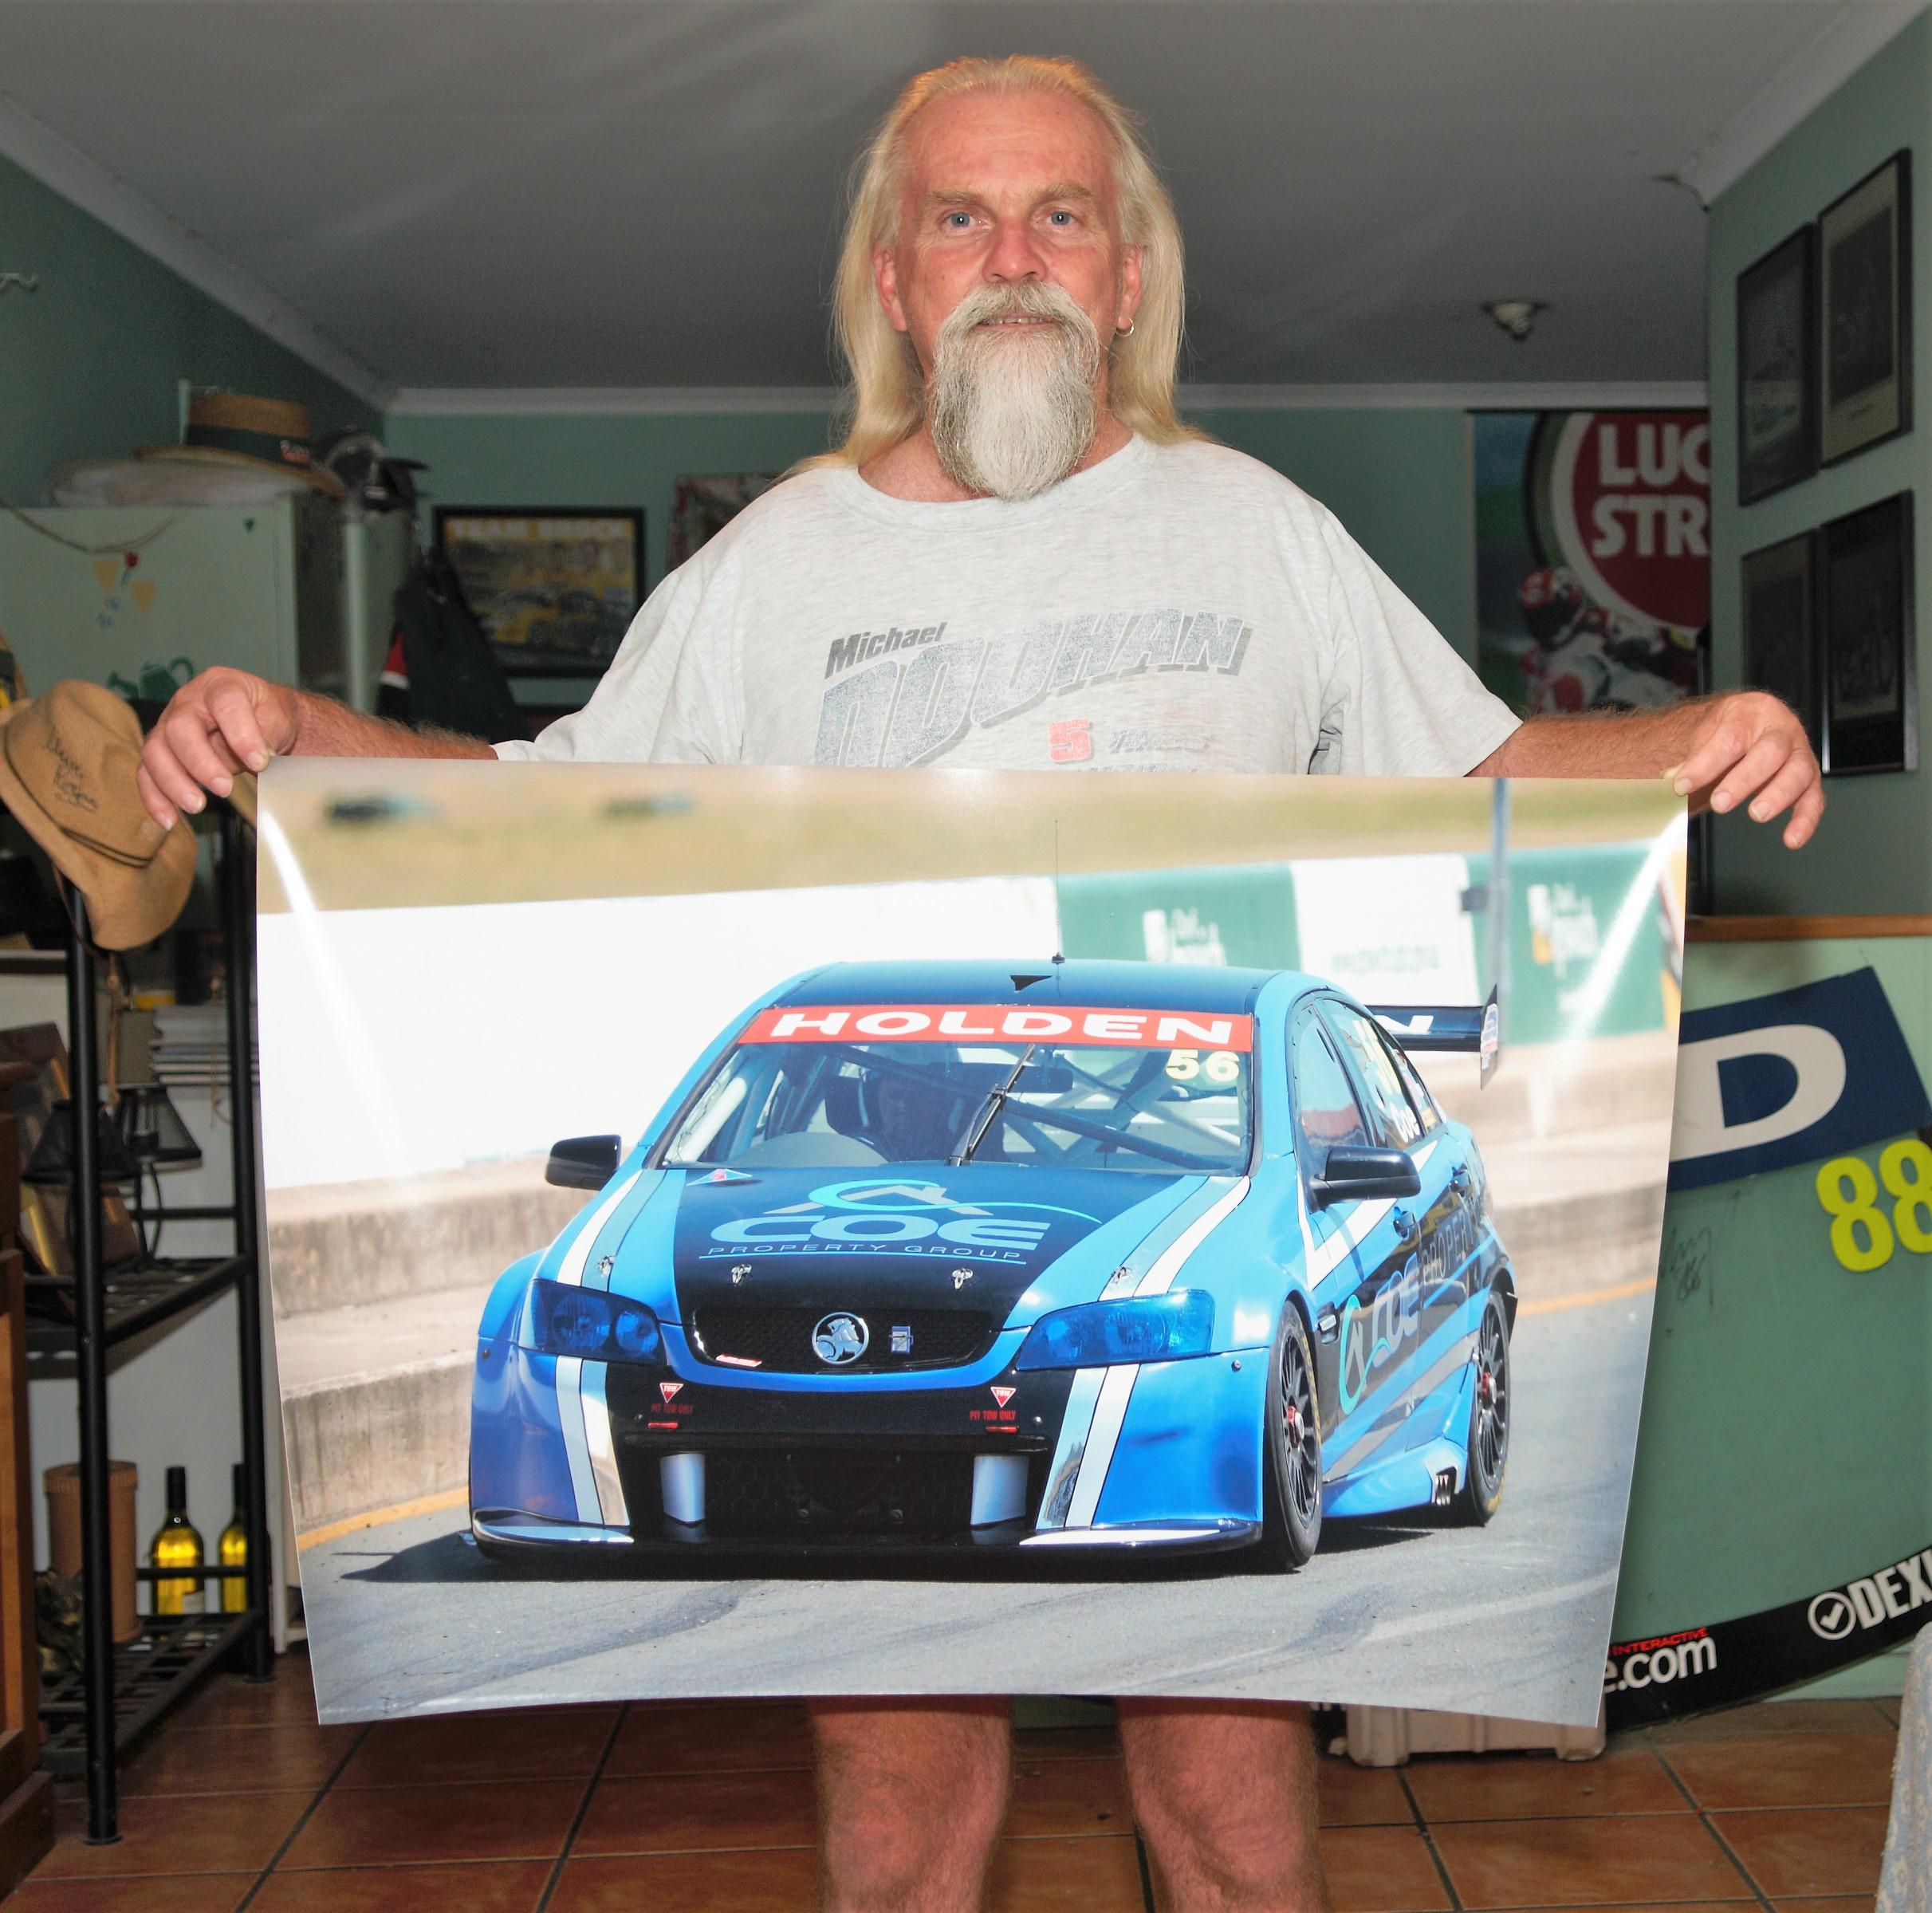 24 x 36 inch print.